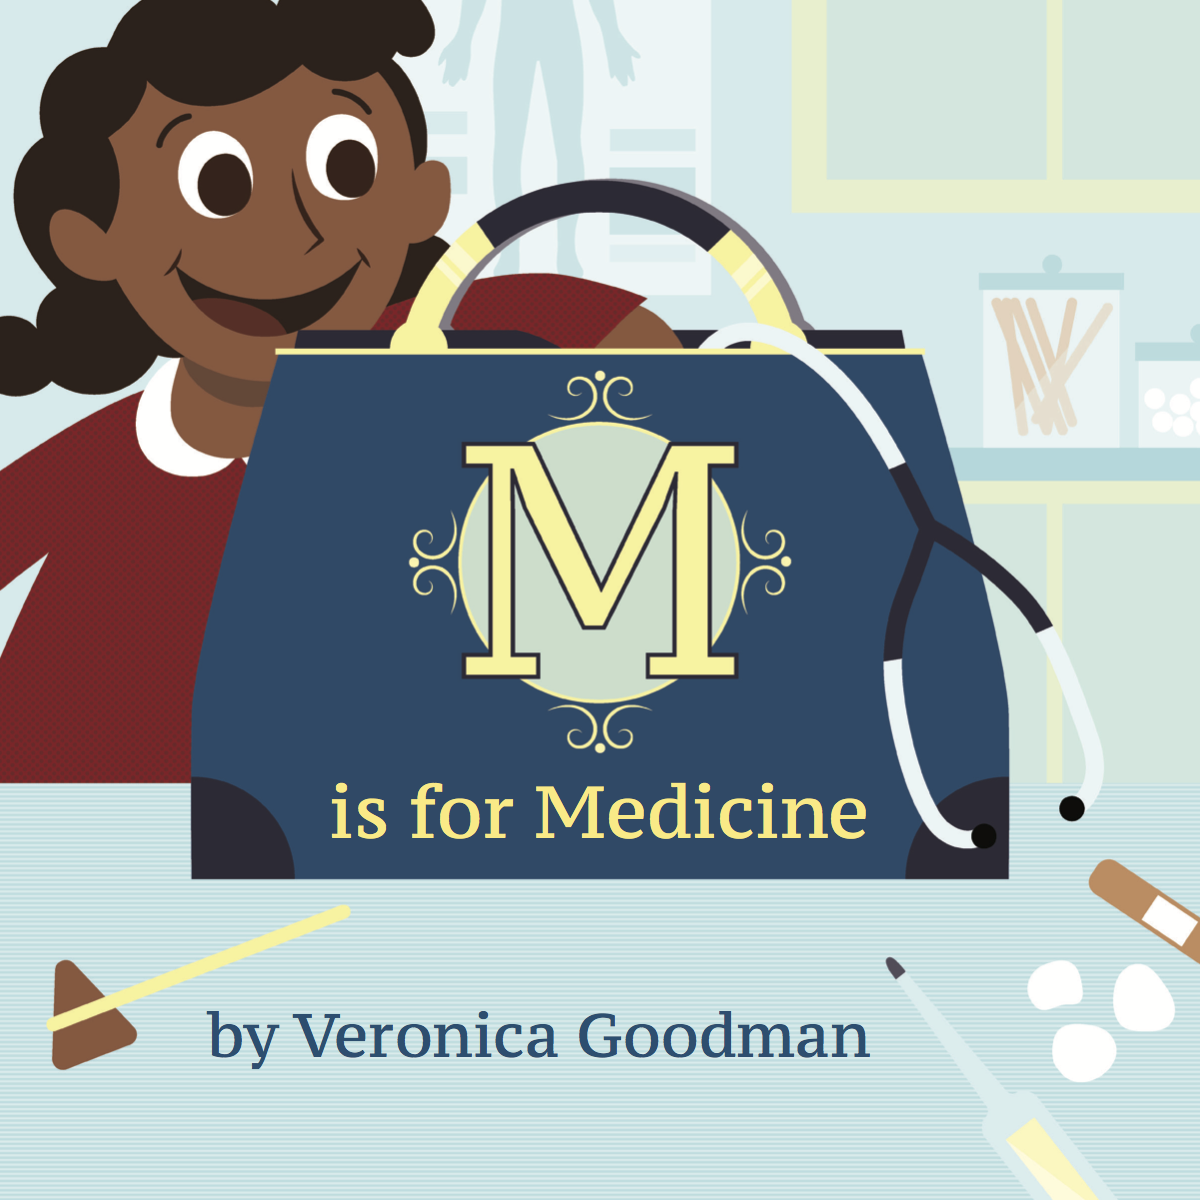 MisforMedicine_cover (2).png